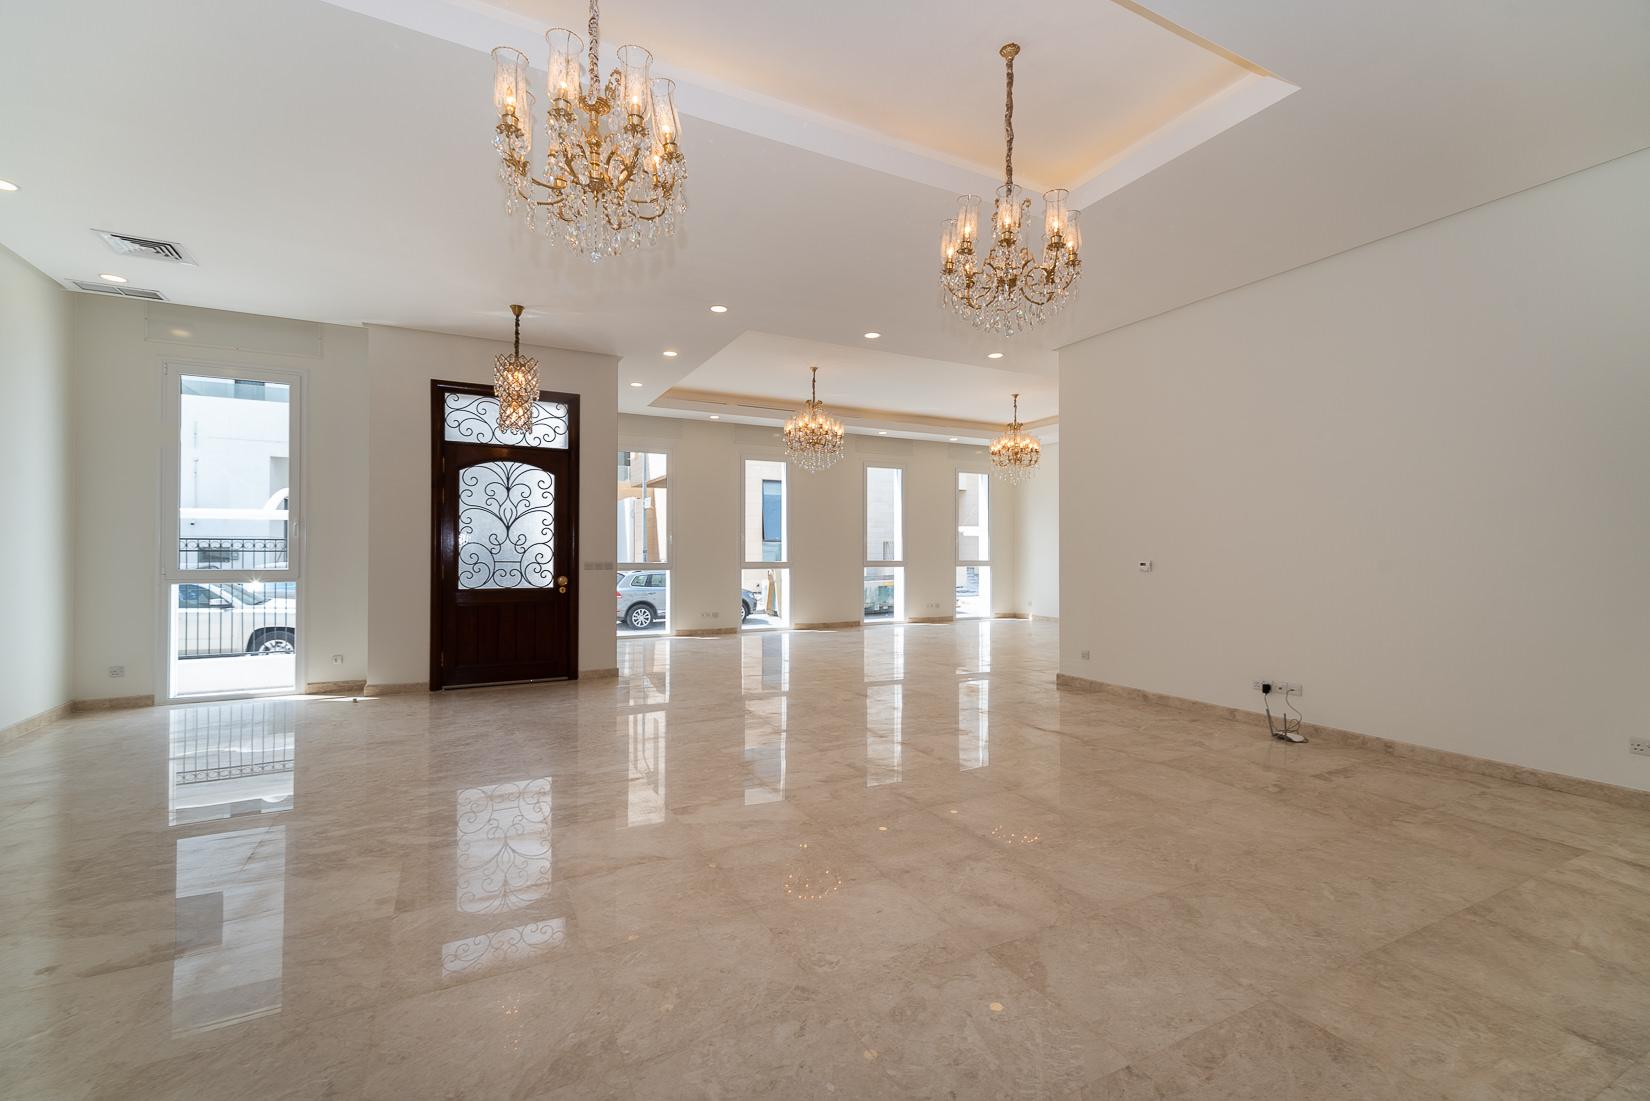 Dahia Abdulla Salem – contemporary, new, spacious villa